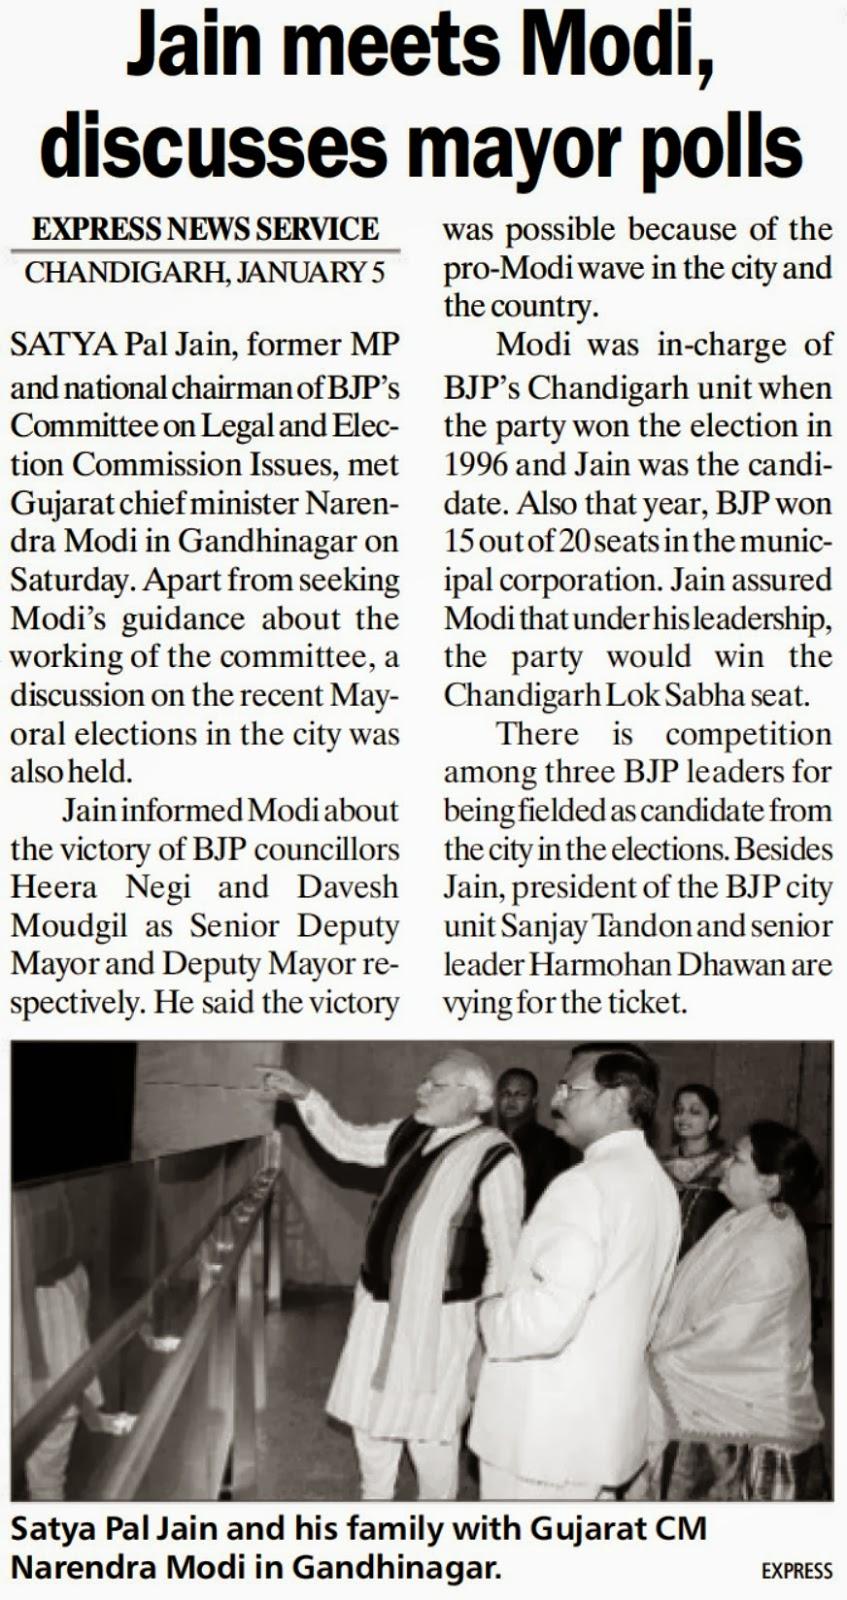 Satya Pal Jain meets Modi, discusses mayor polls